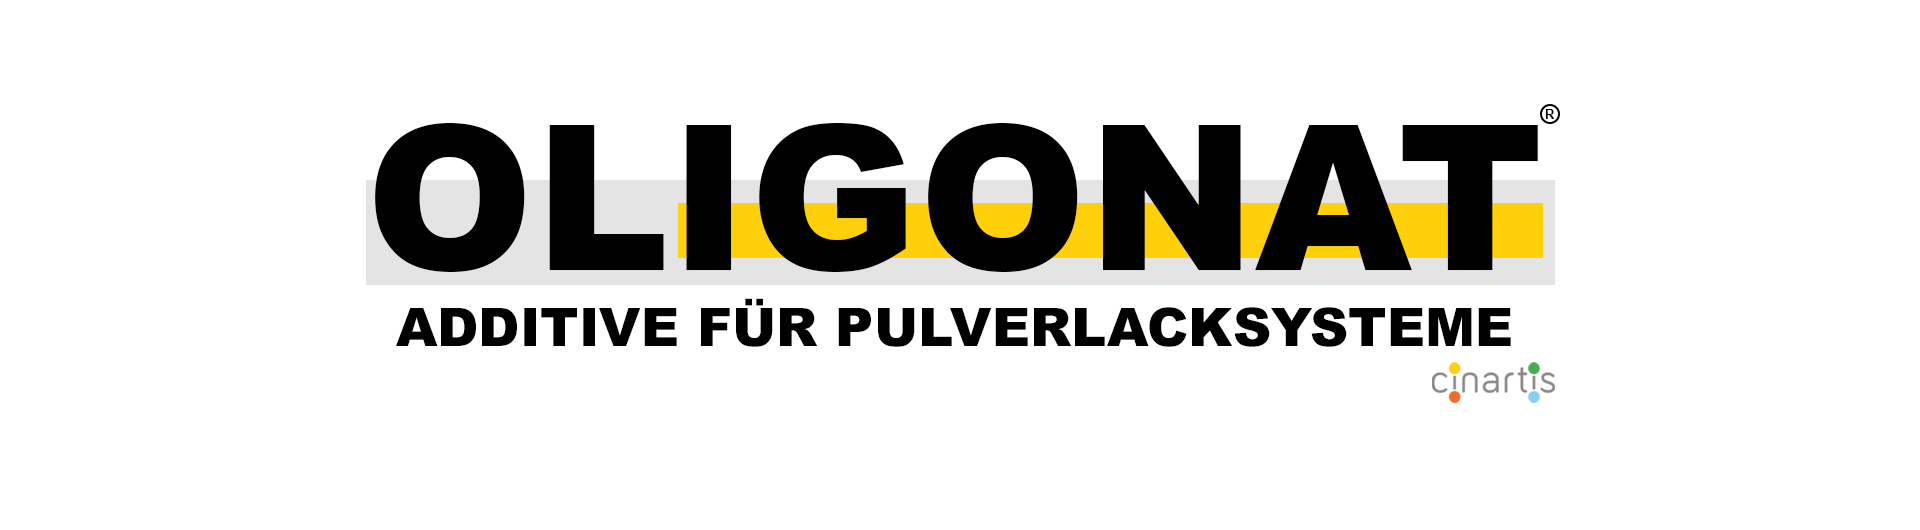 oligonat cover image small copyright2